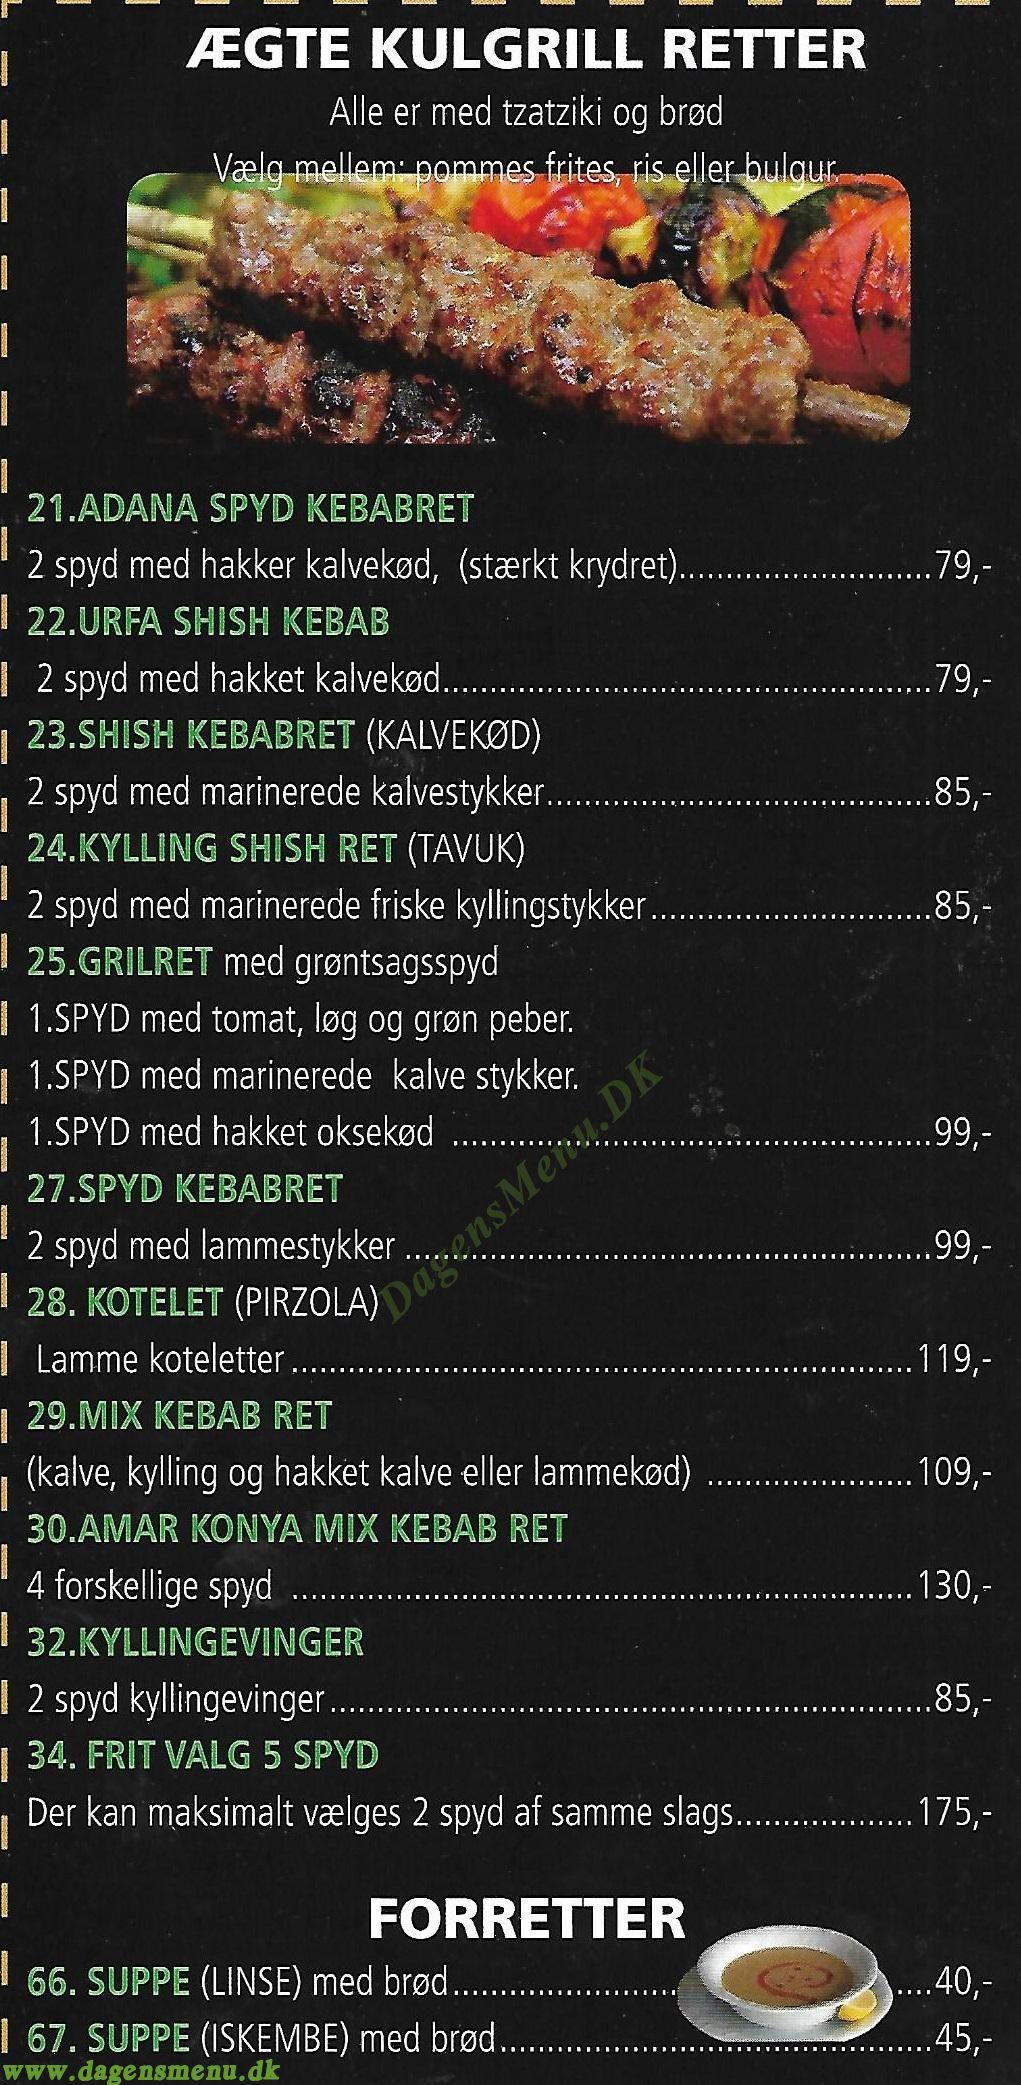 Amar Konya Kebab Amager - Menukort